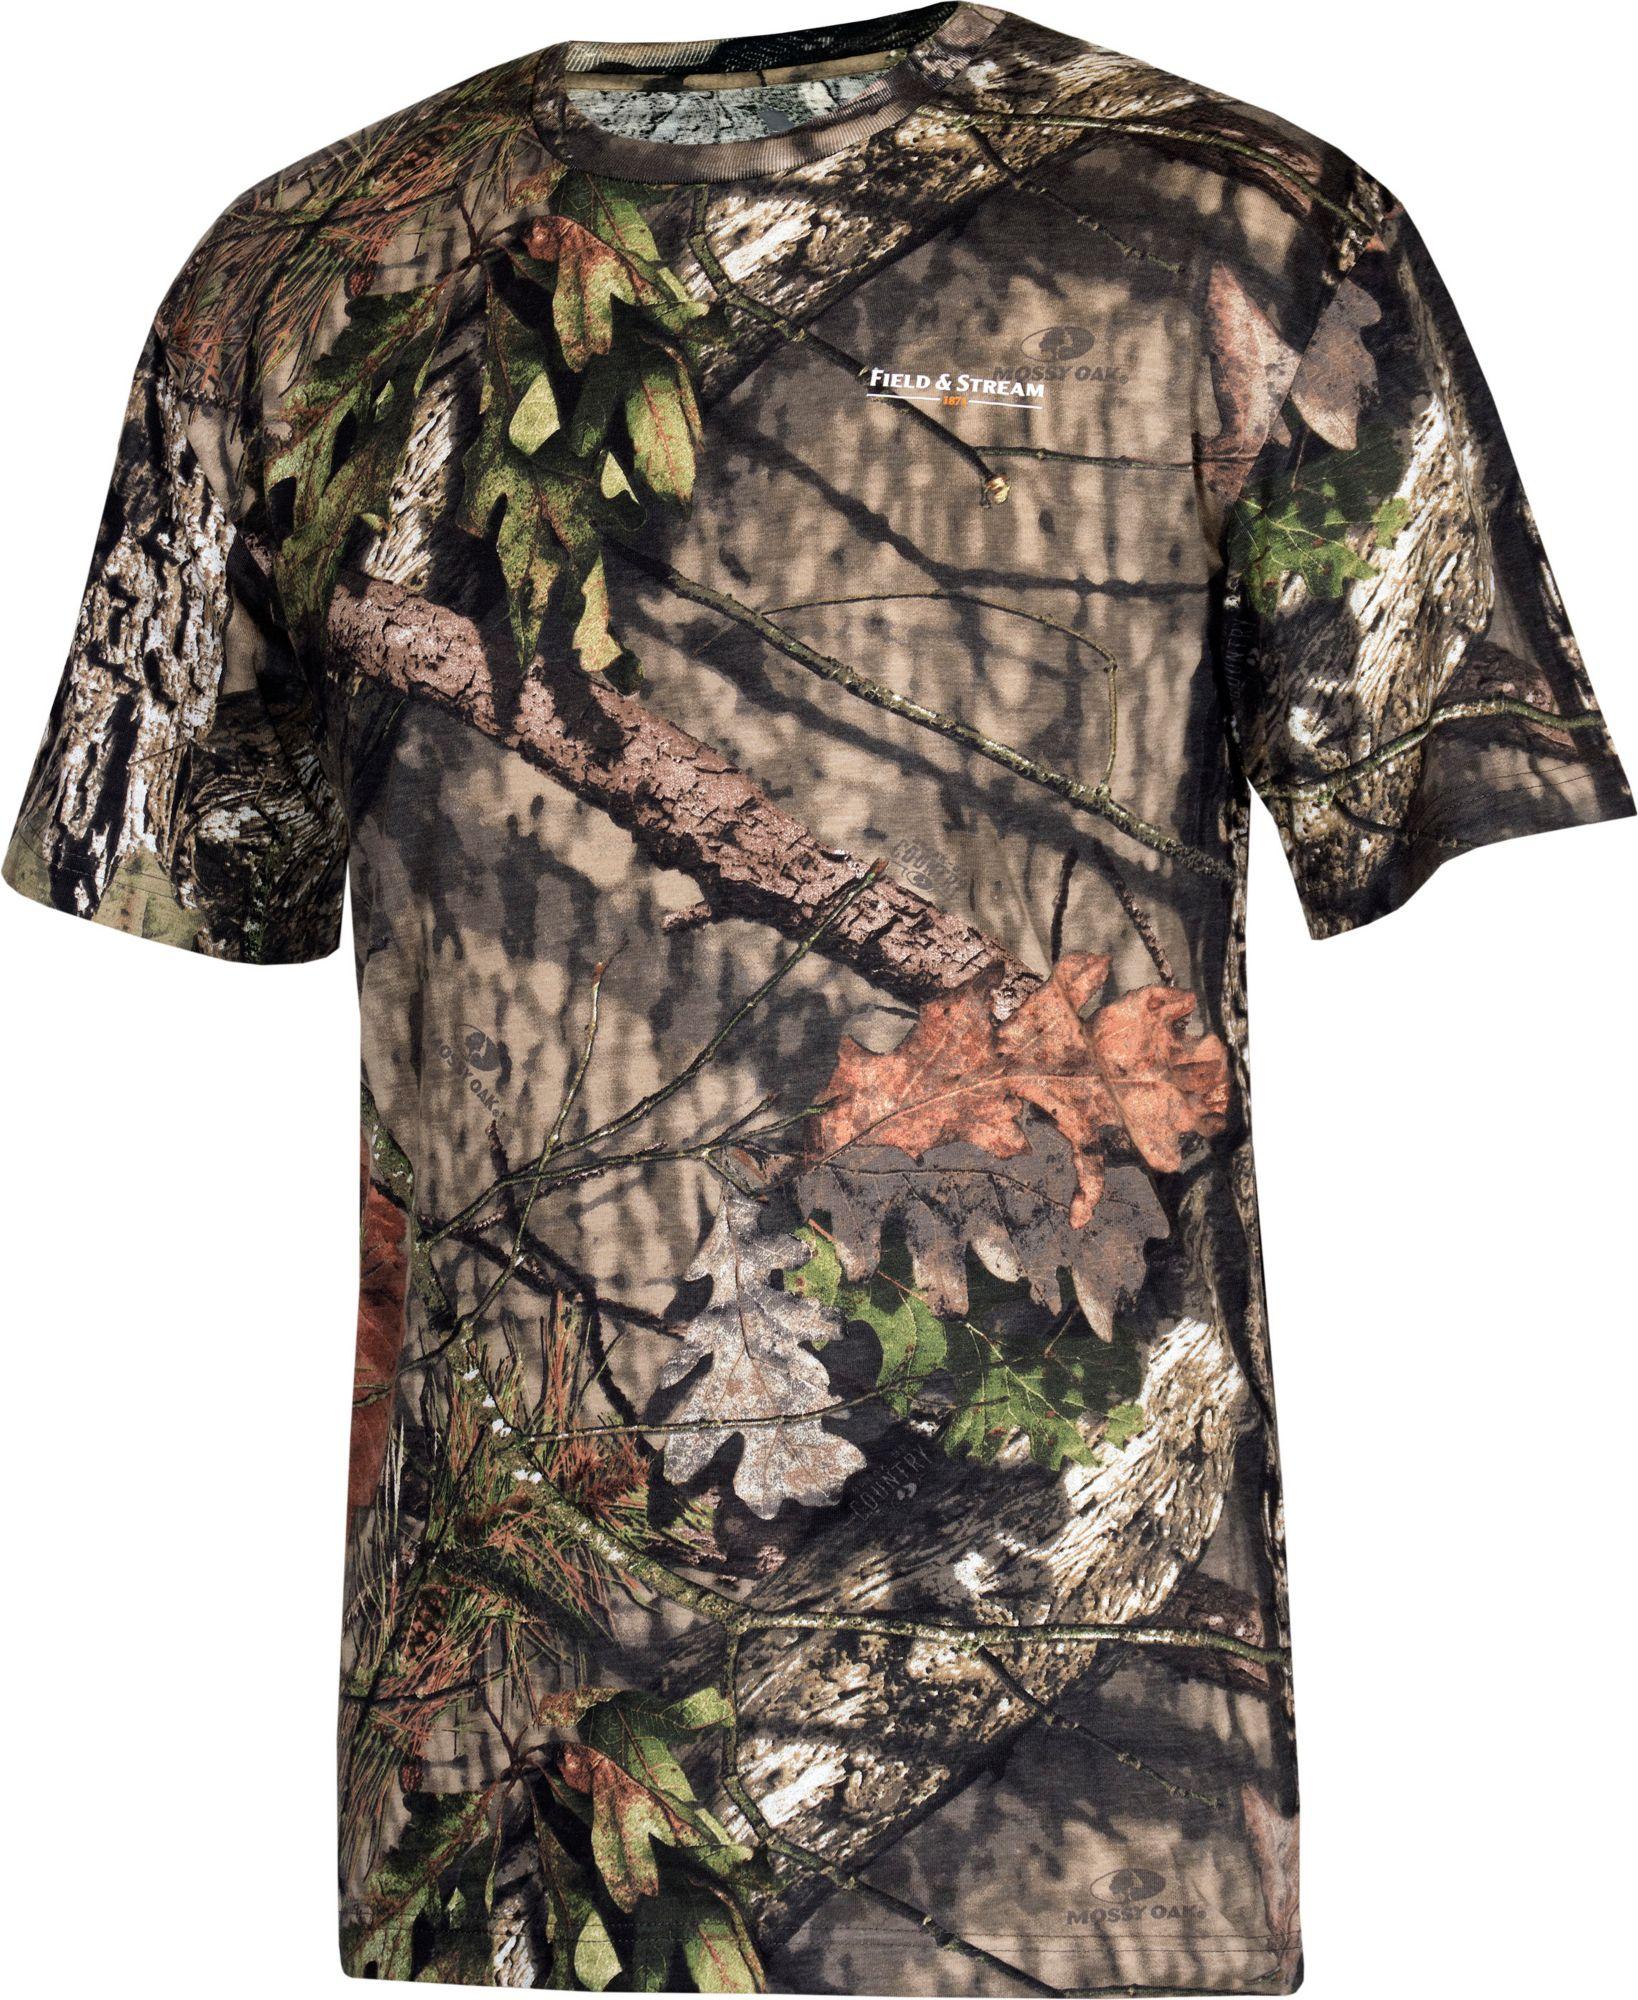 Field & Stream Men's Camo T-Shirt, Size: XXXL, Mossy Oak Brk-Up Country